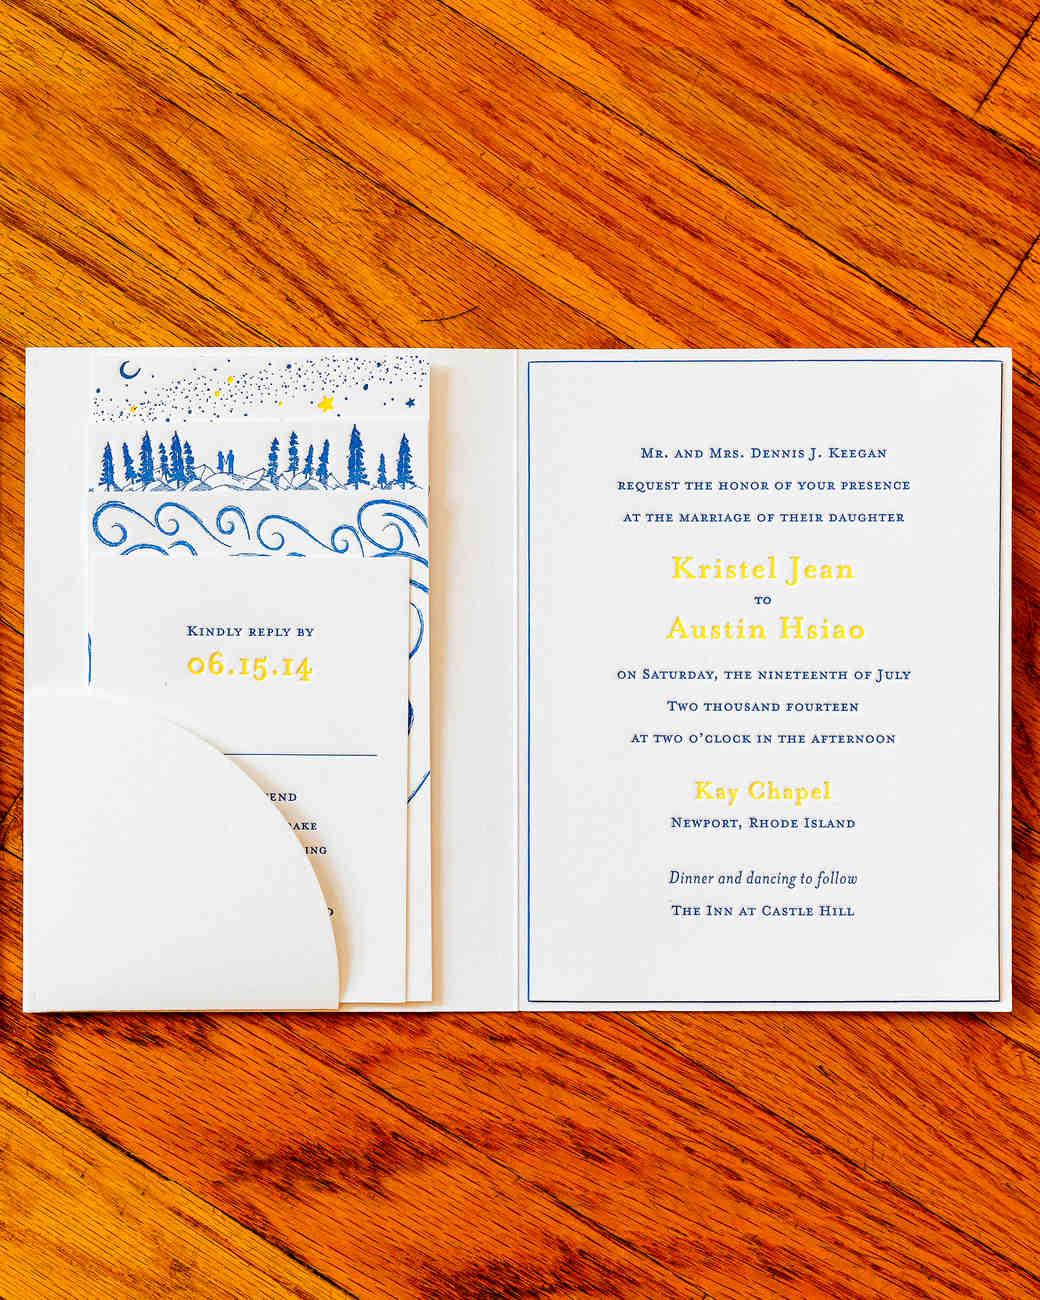 kristel-austin-wedding-invite-0282-s11860-0415.jpg